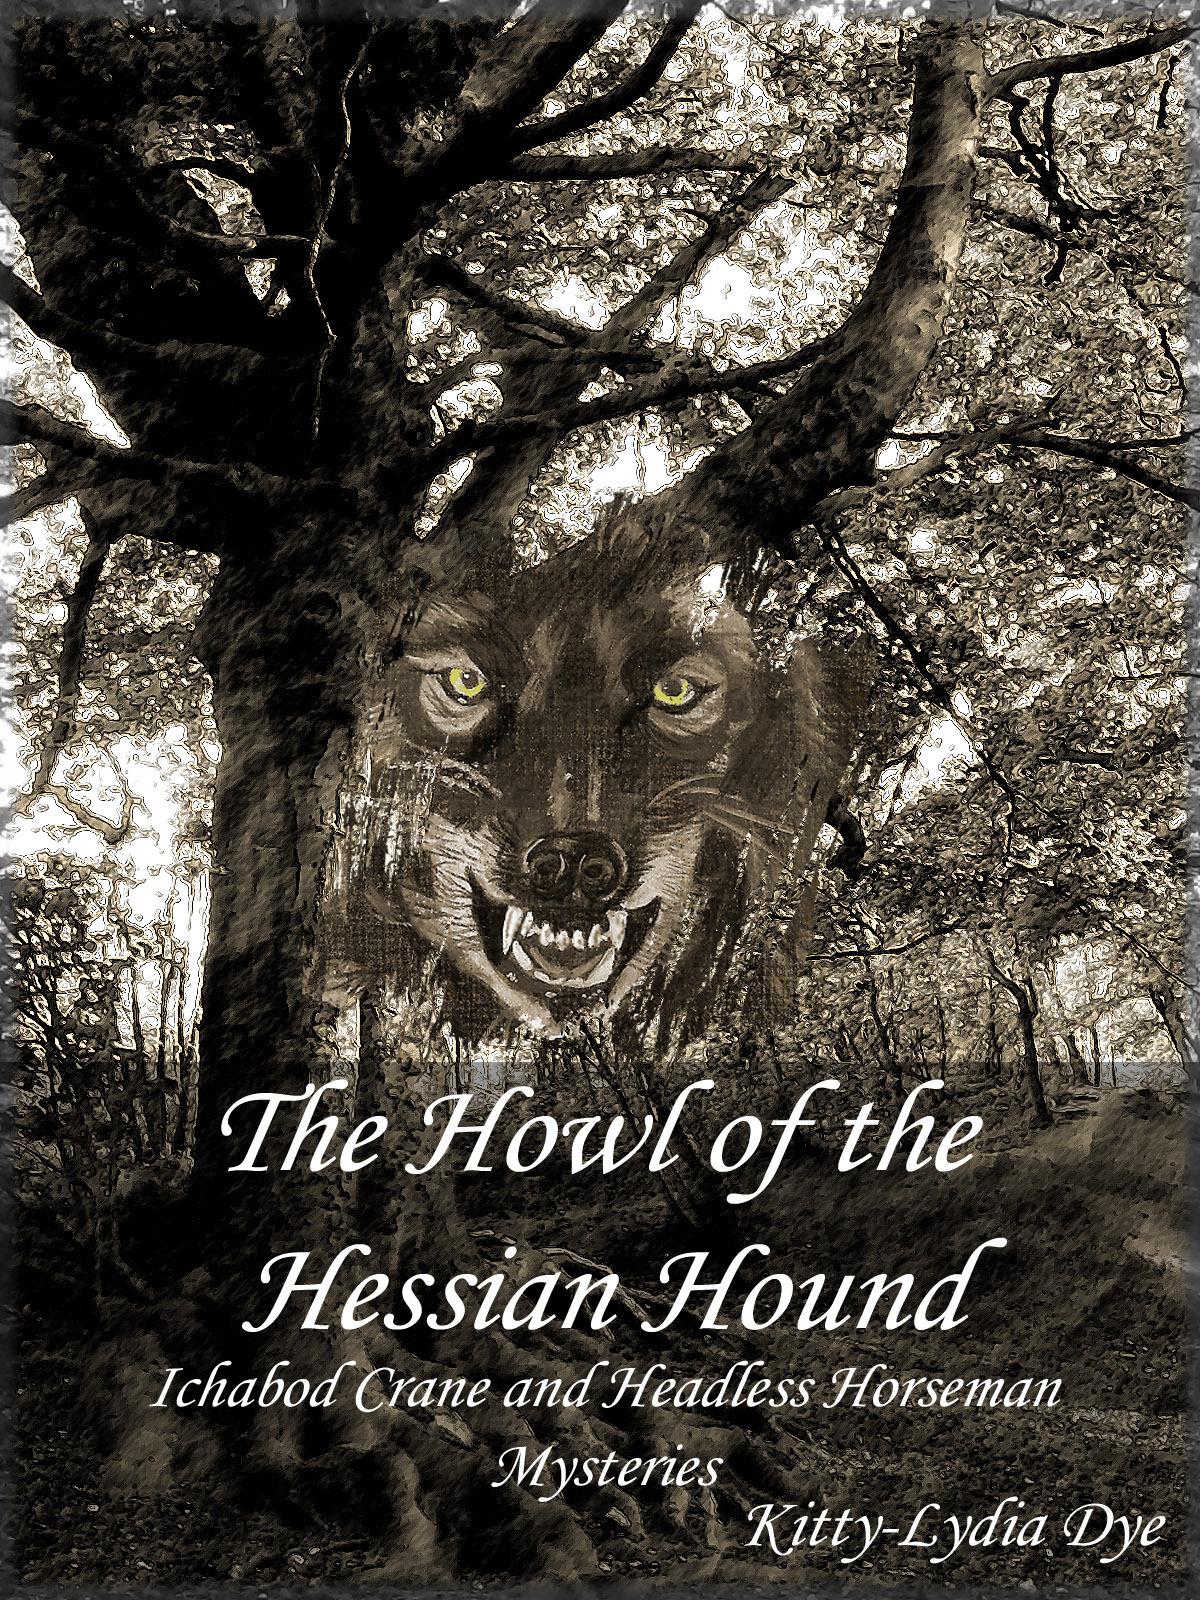 The Howl of the Hessian Hound (Ichabod Crane and Headless Horseman Mysteries, #2) Kitty-Lydia Dye